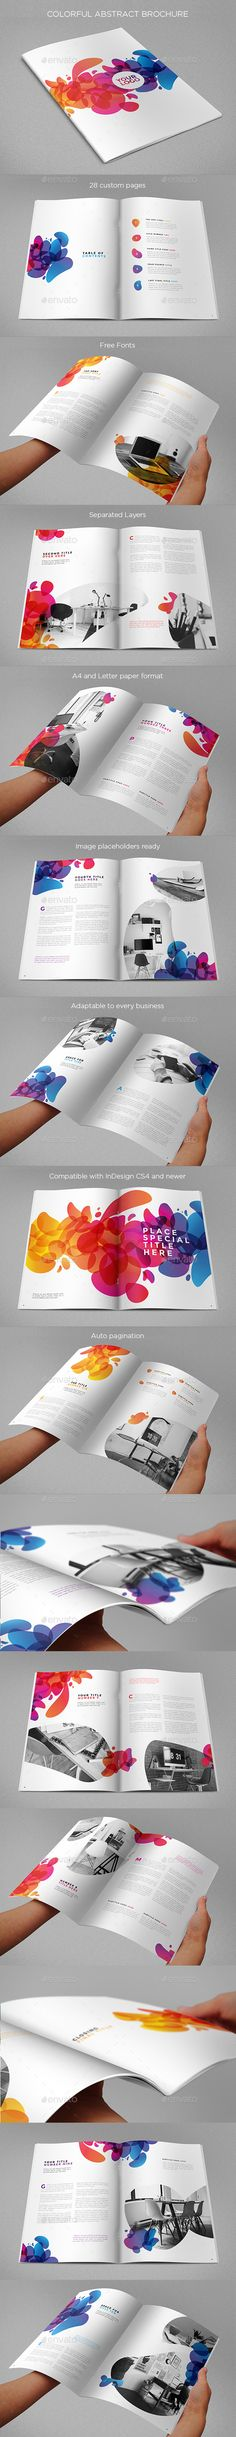 Colorful Pattern Brochure by Abra Design, via Behance Design - retro brochure template